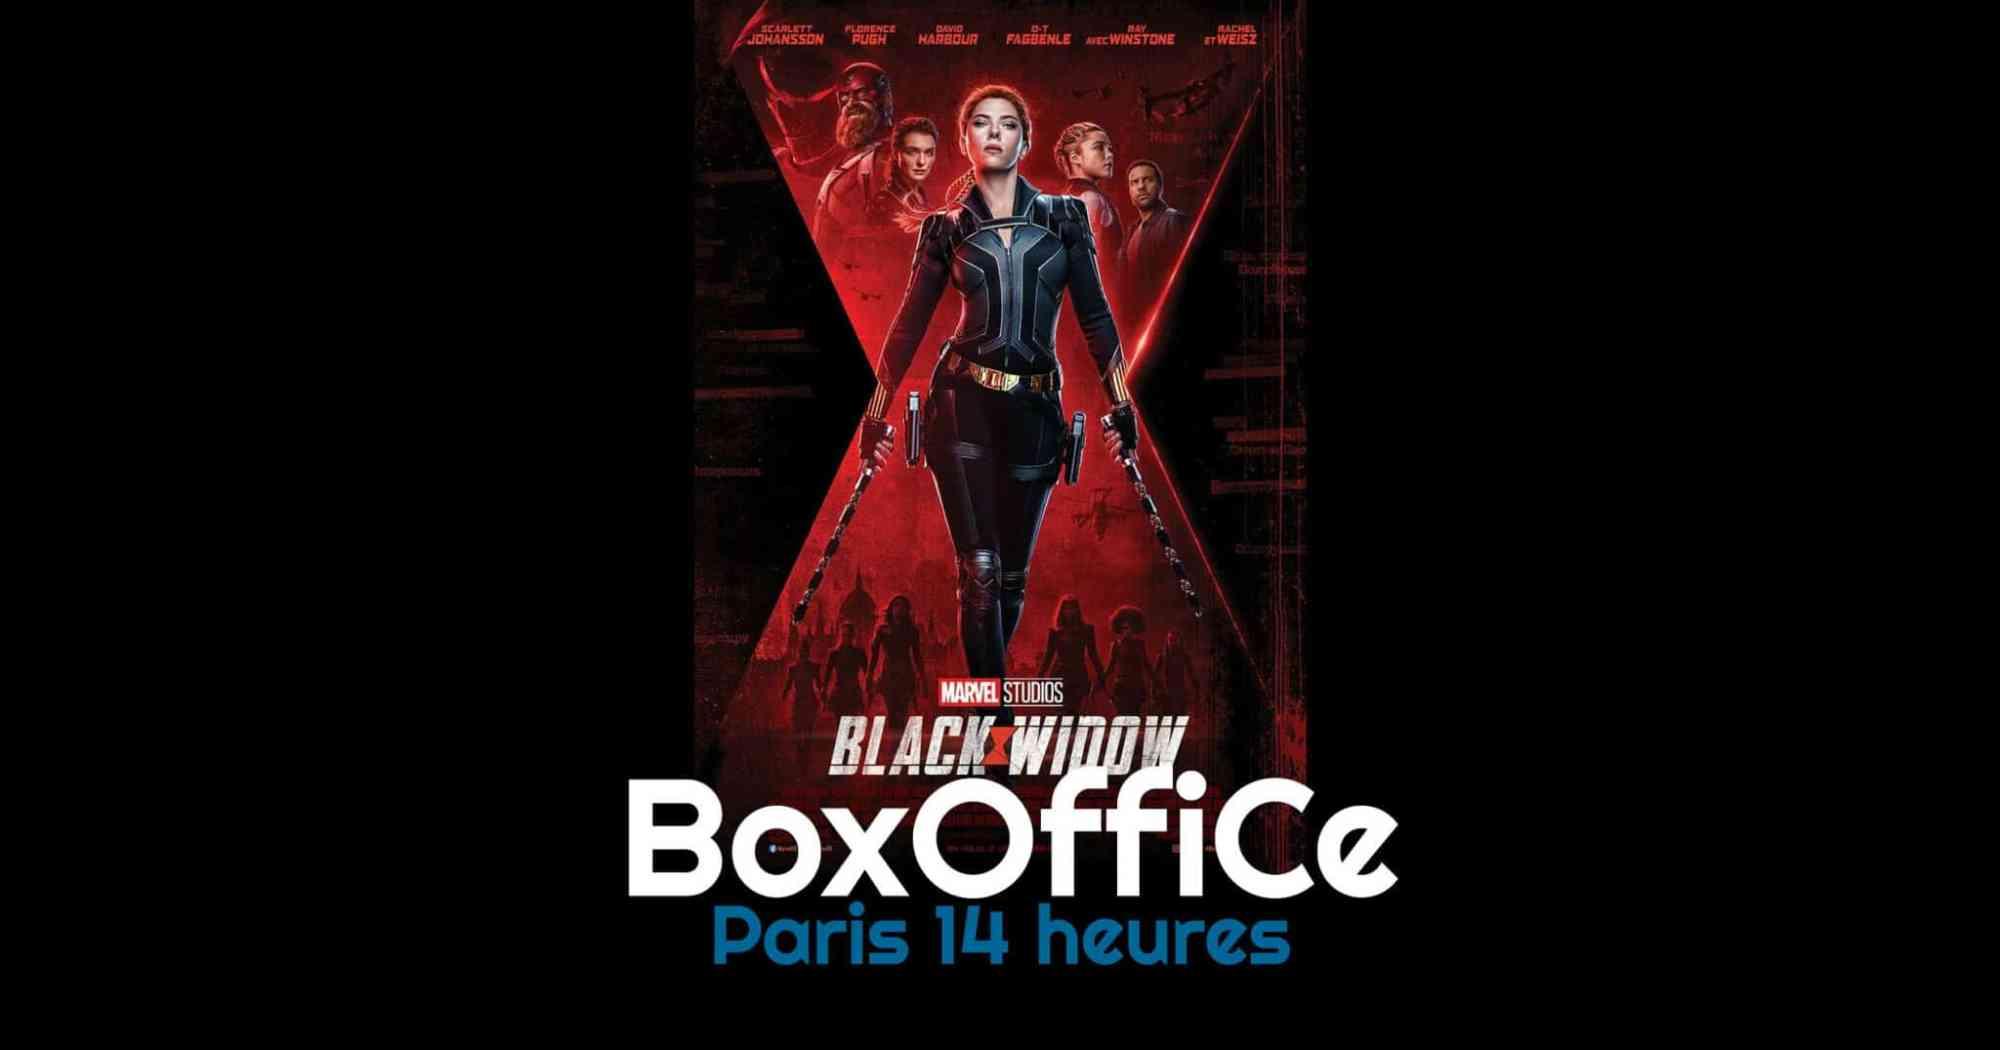 Box-office Paris 14 : Black Widow triomphe